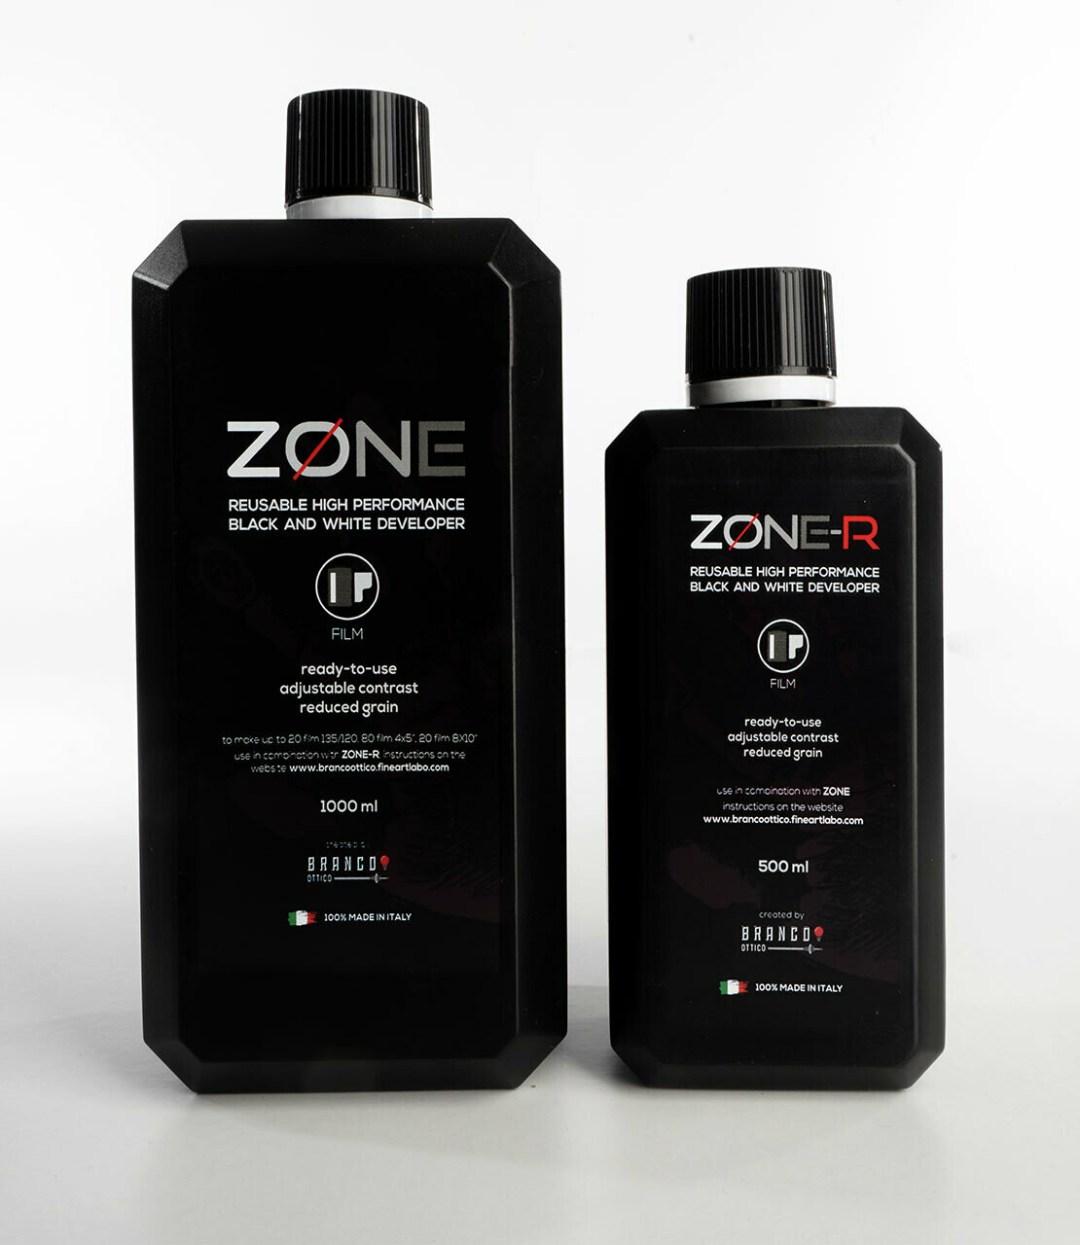 ZONE black and white film developer